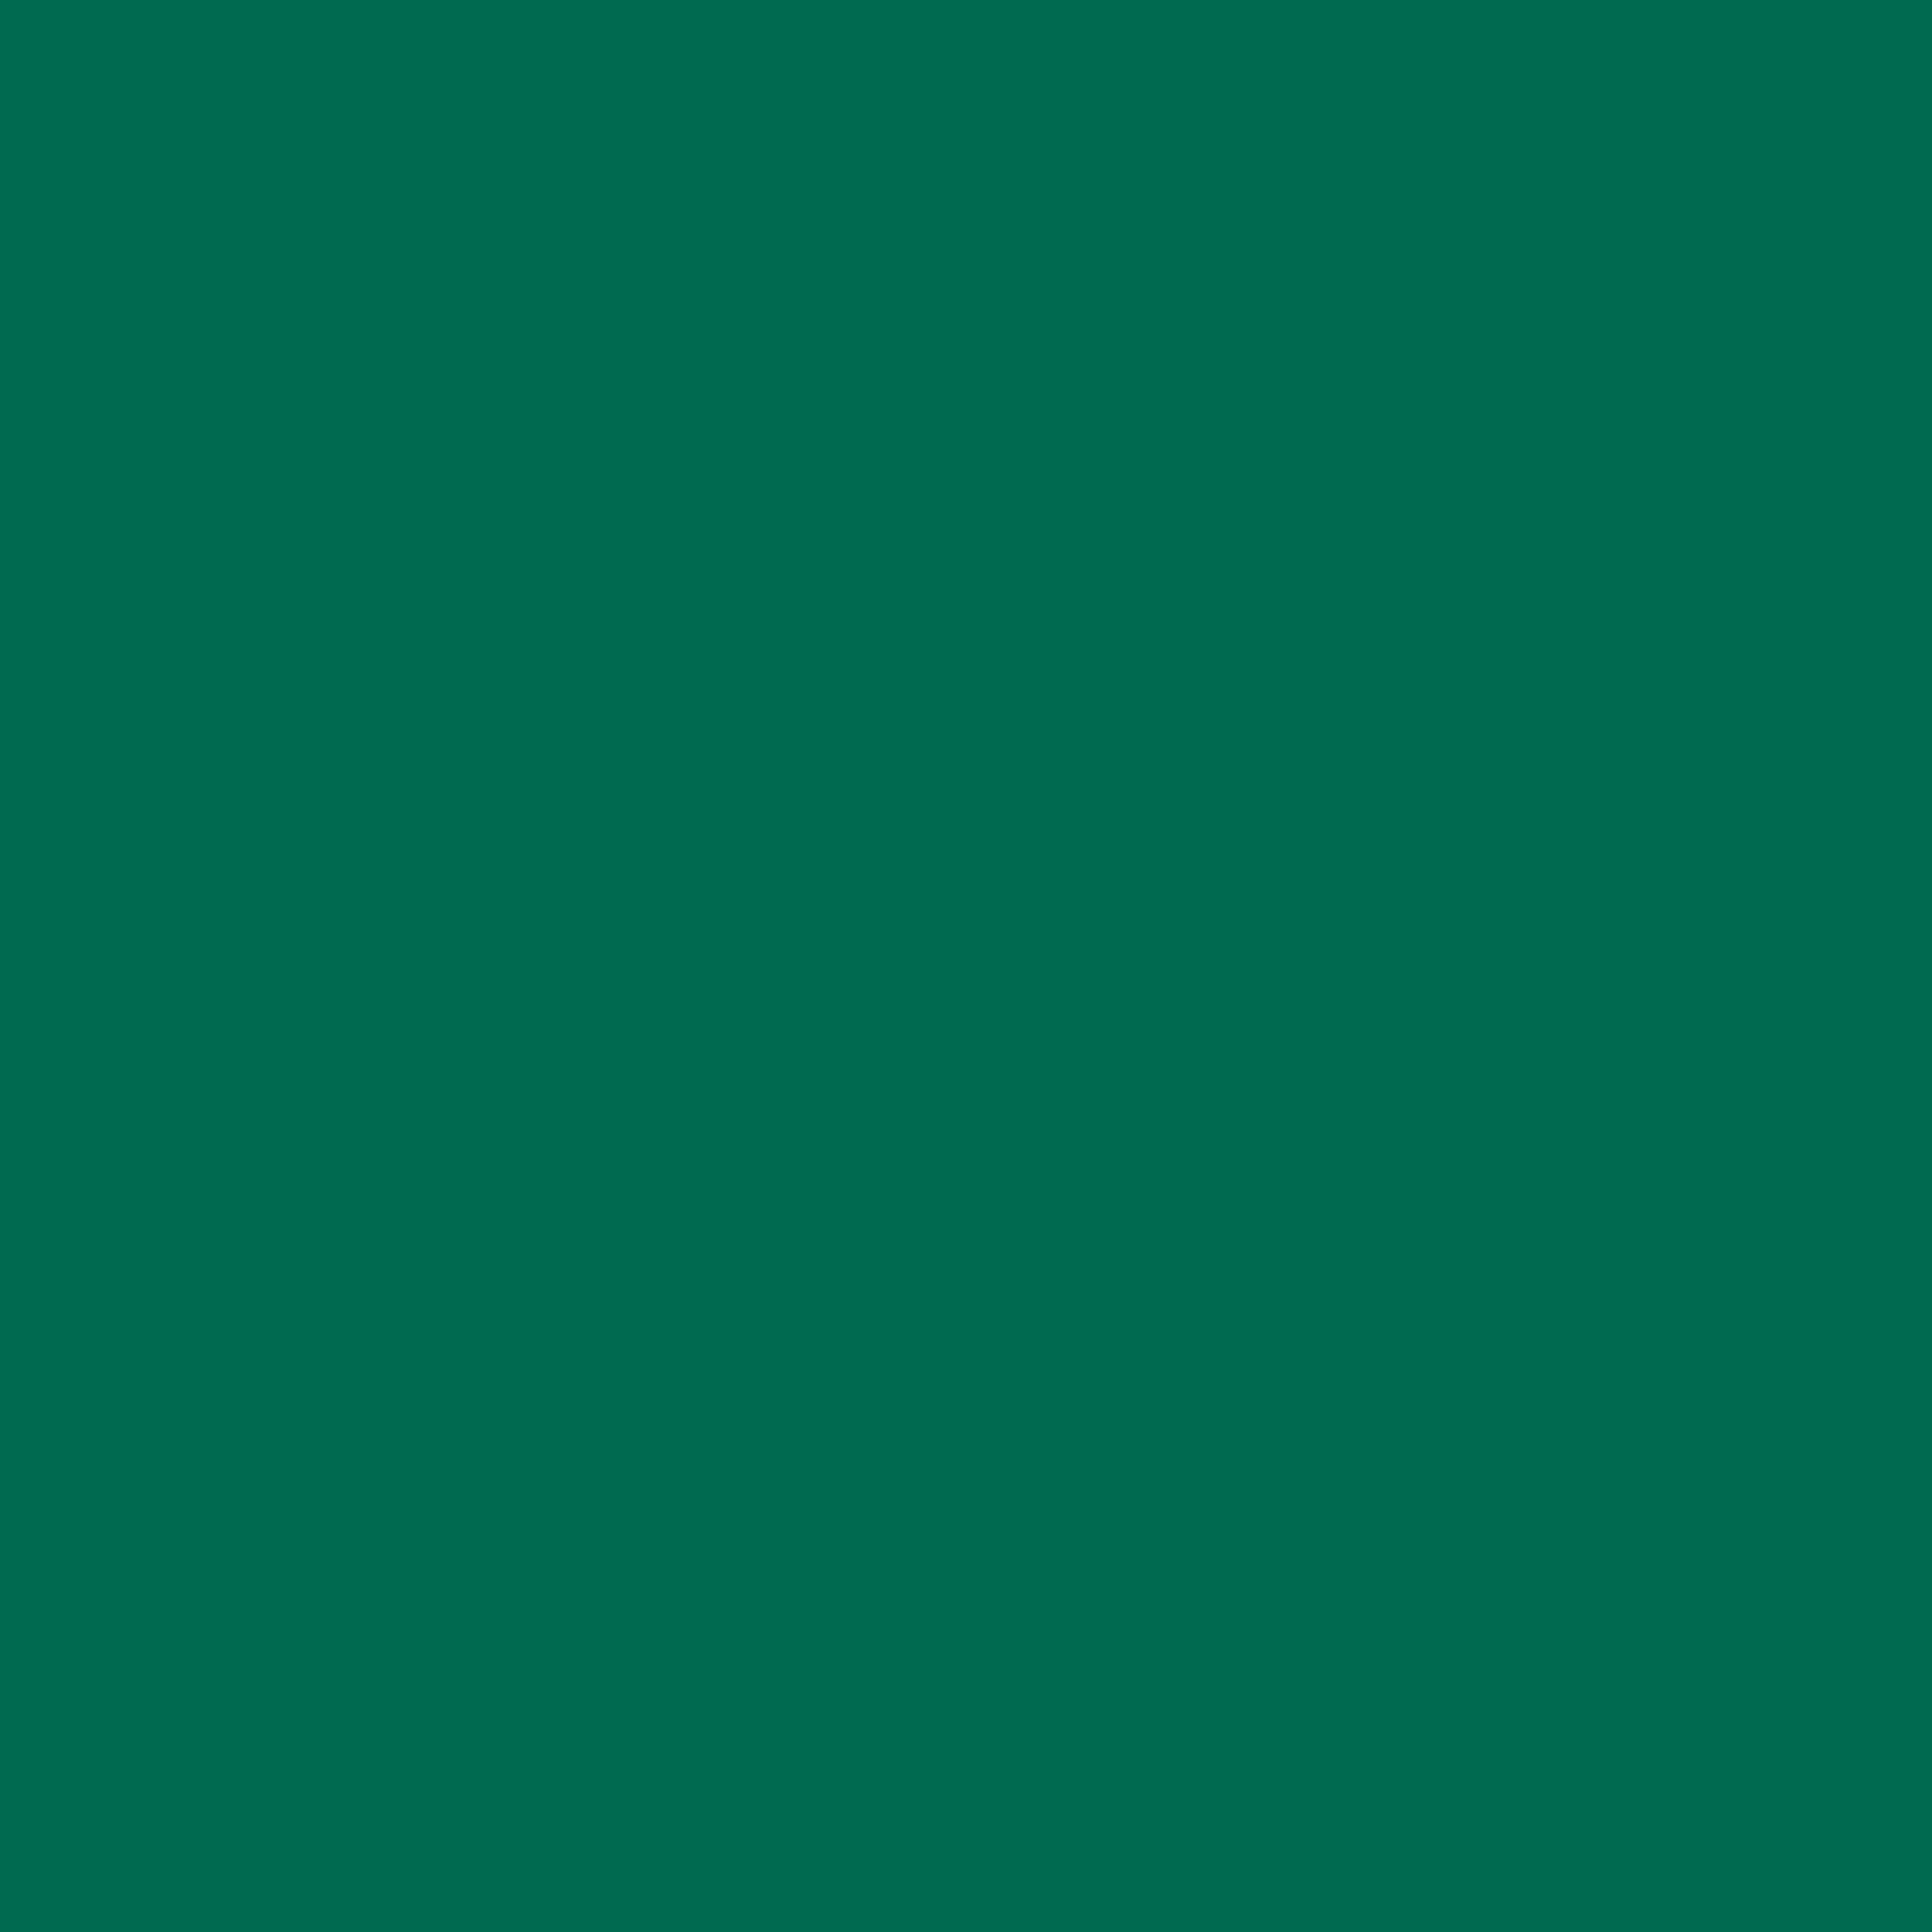 2048x2048 Bottle Green Solid Color Background